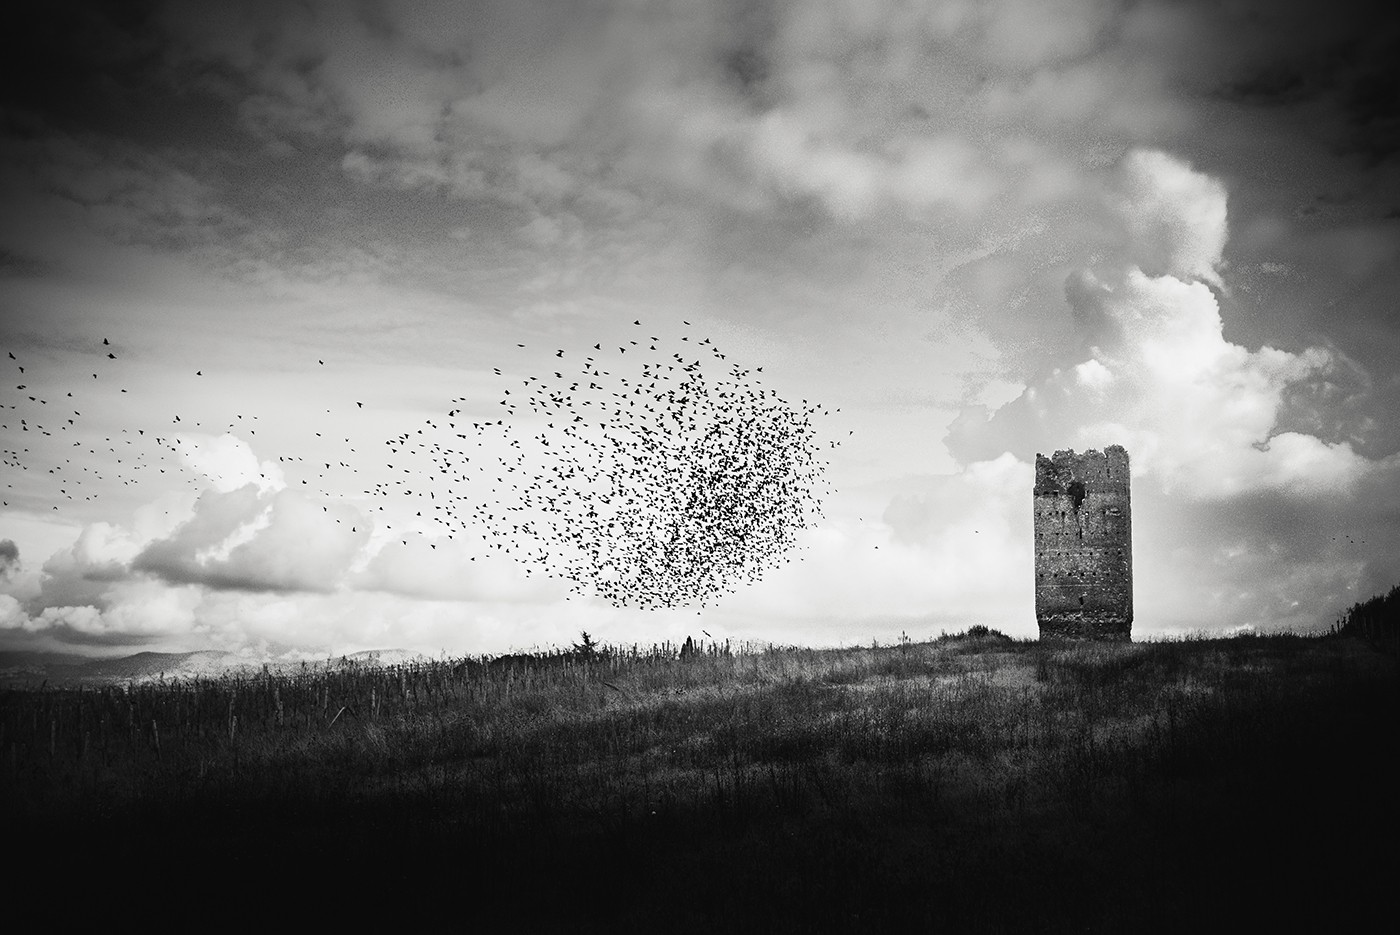 The Birds by Michelle Aschbacher